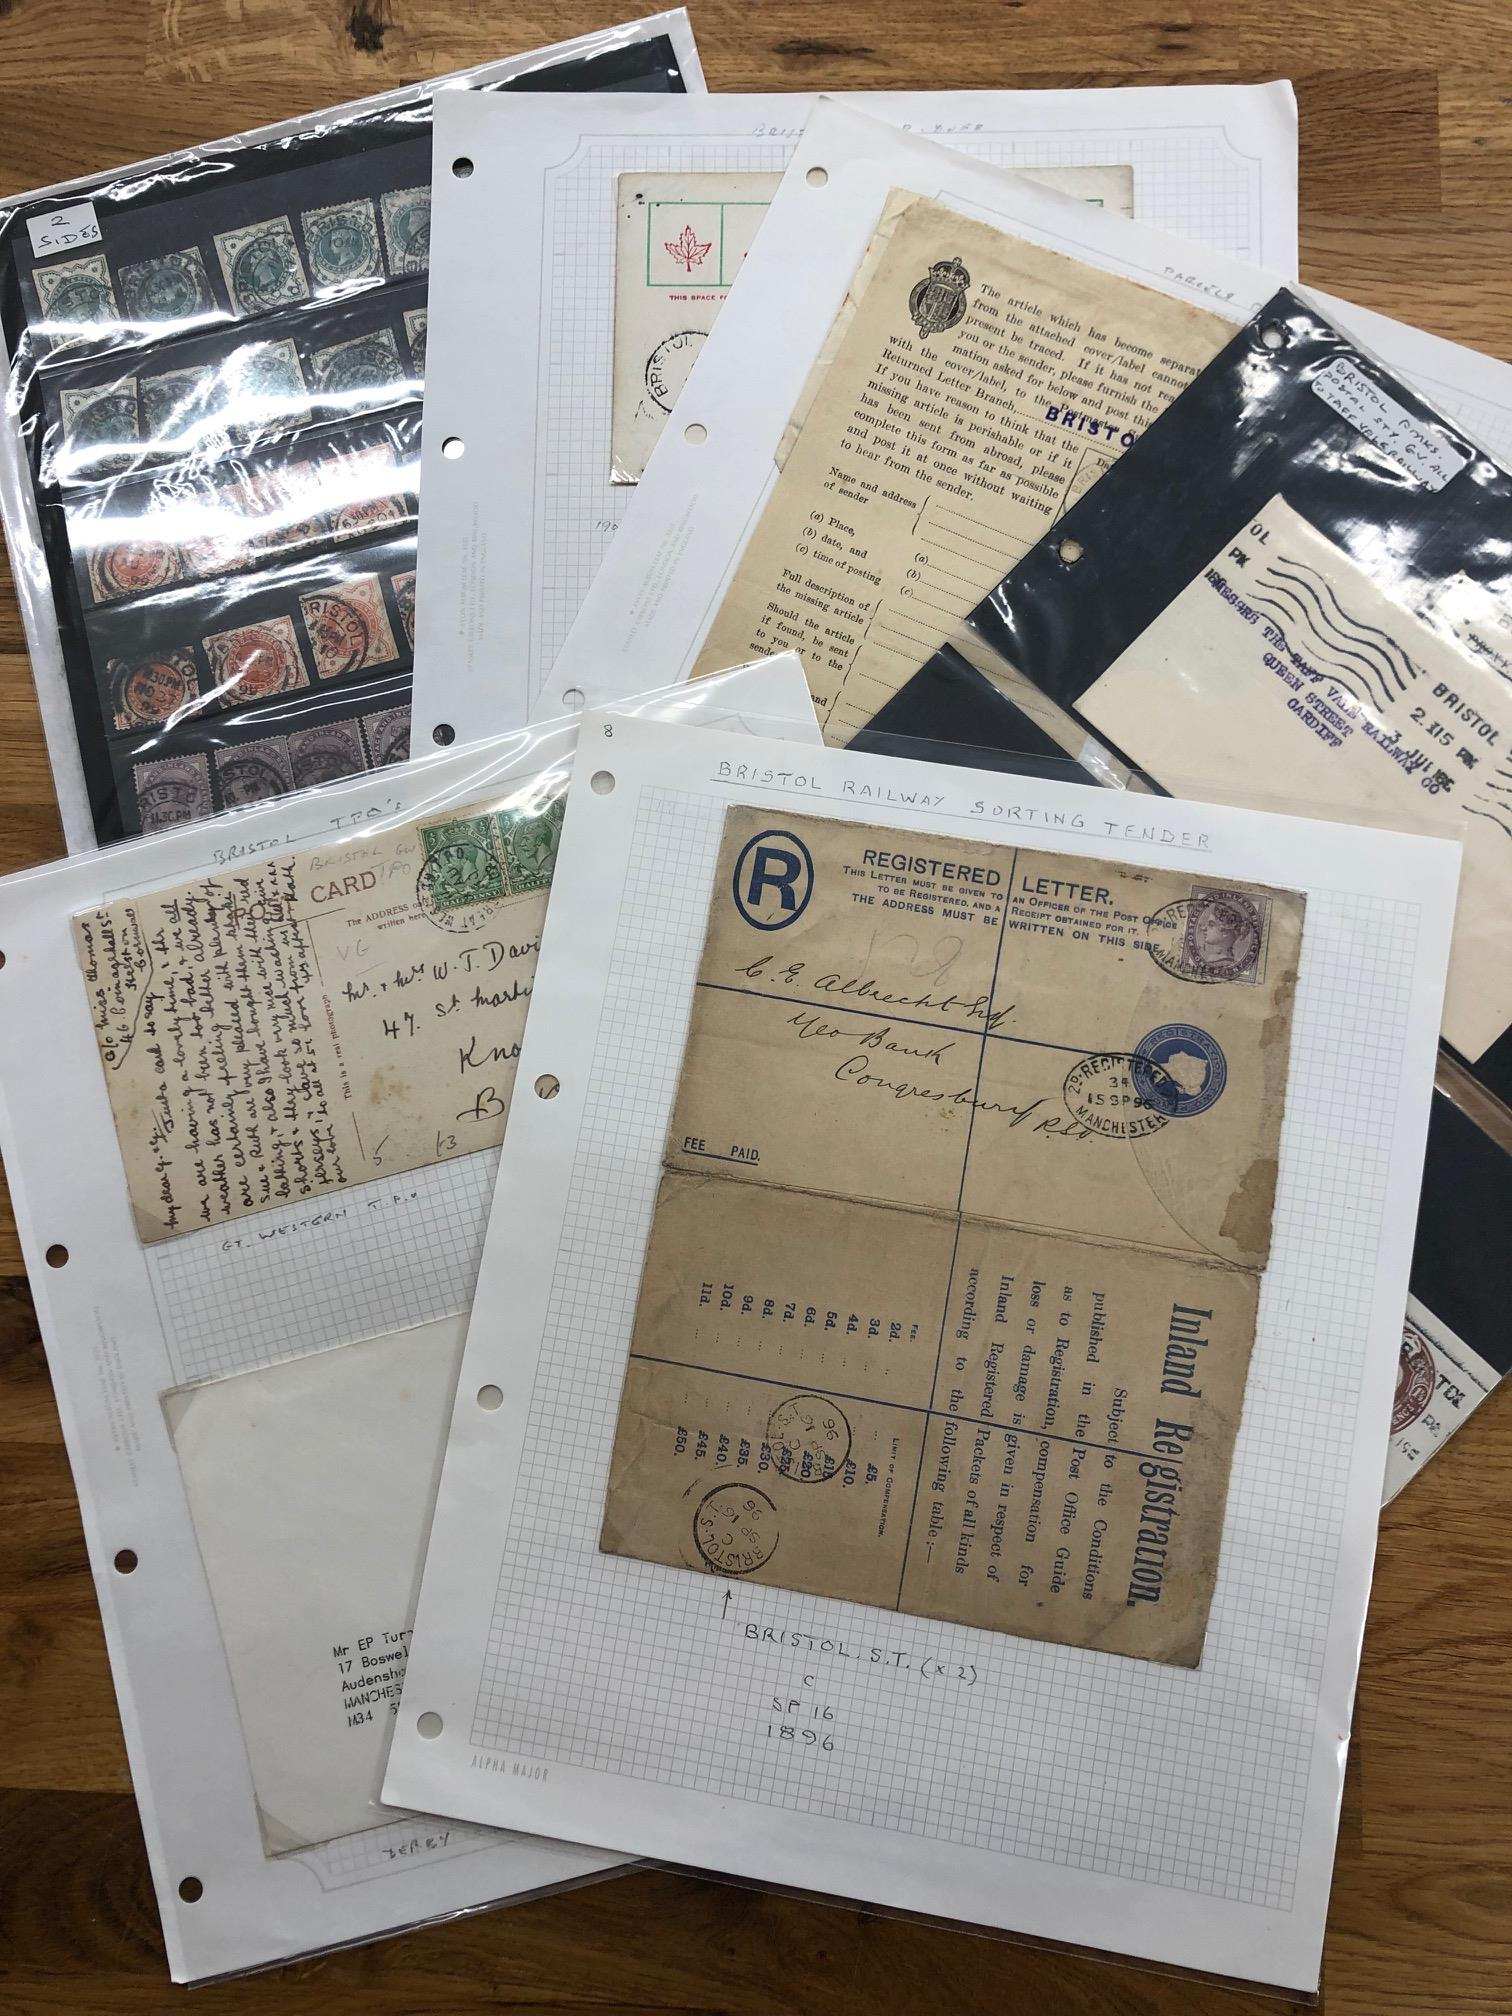 POSTAL HISTORY a packet of TPOs, Sorting Tenders, Taff Vale Rail, PDs, Bristol to Birmingham 1st Air